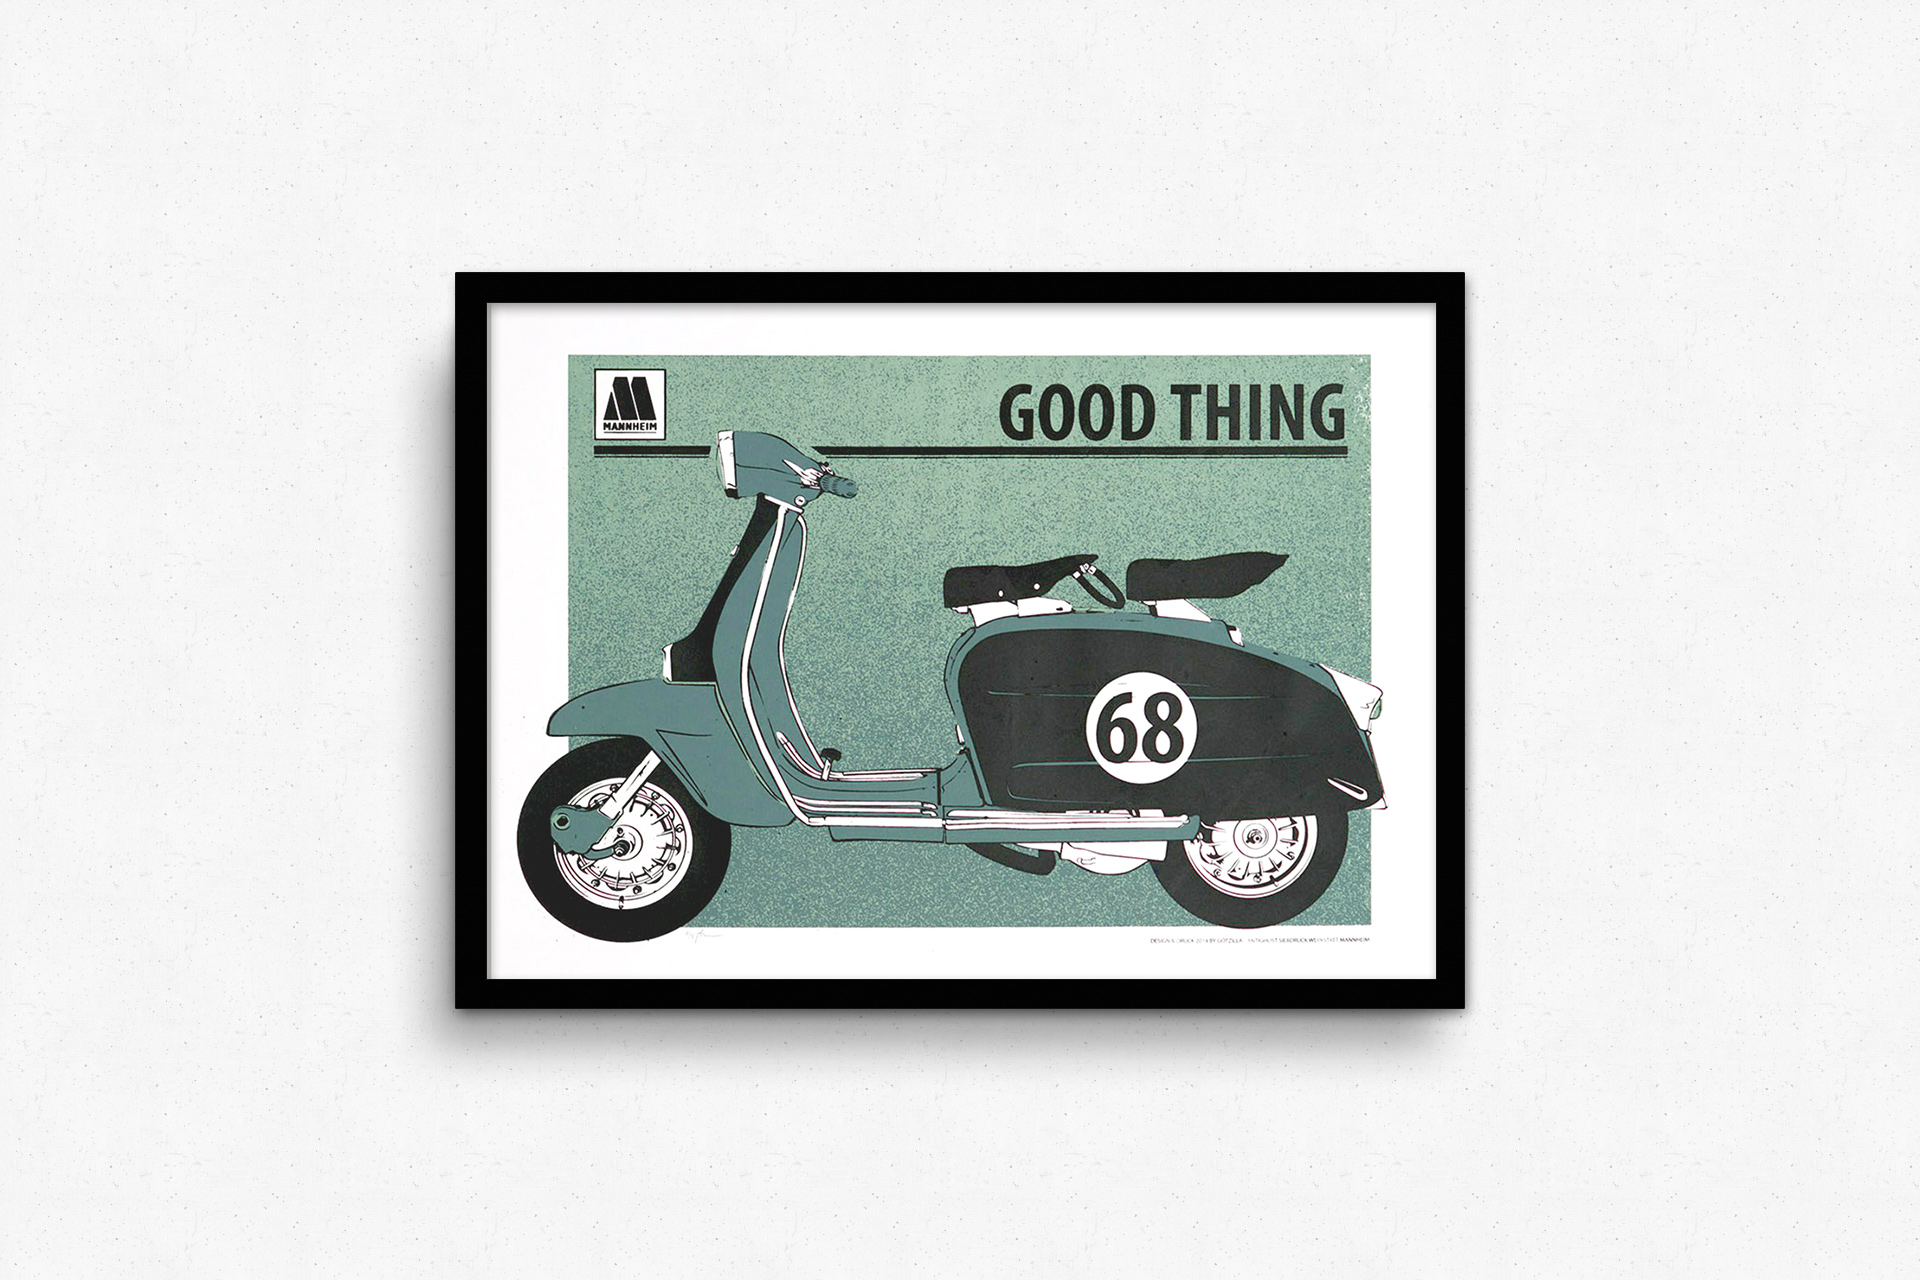 Good Thing 68